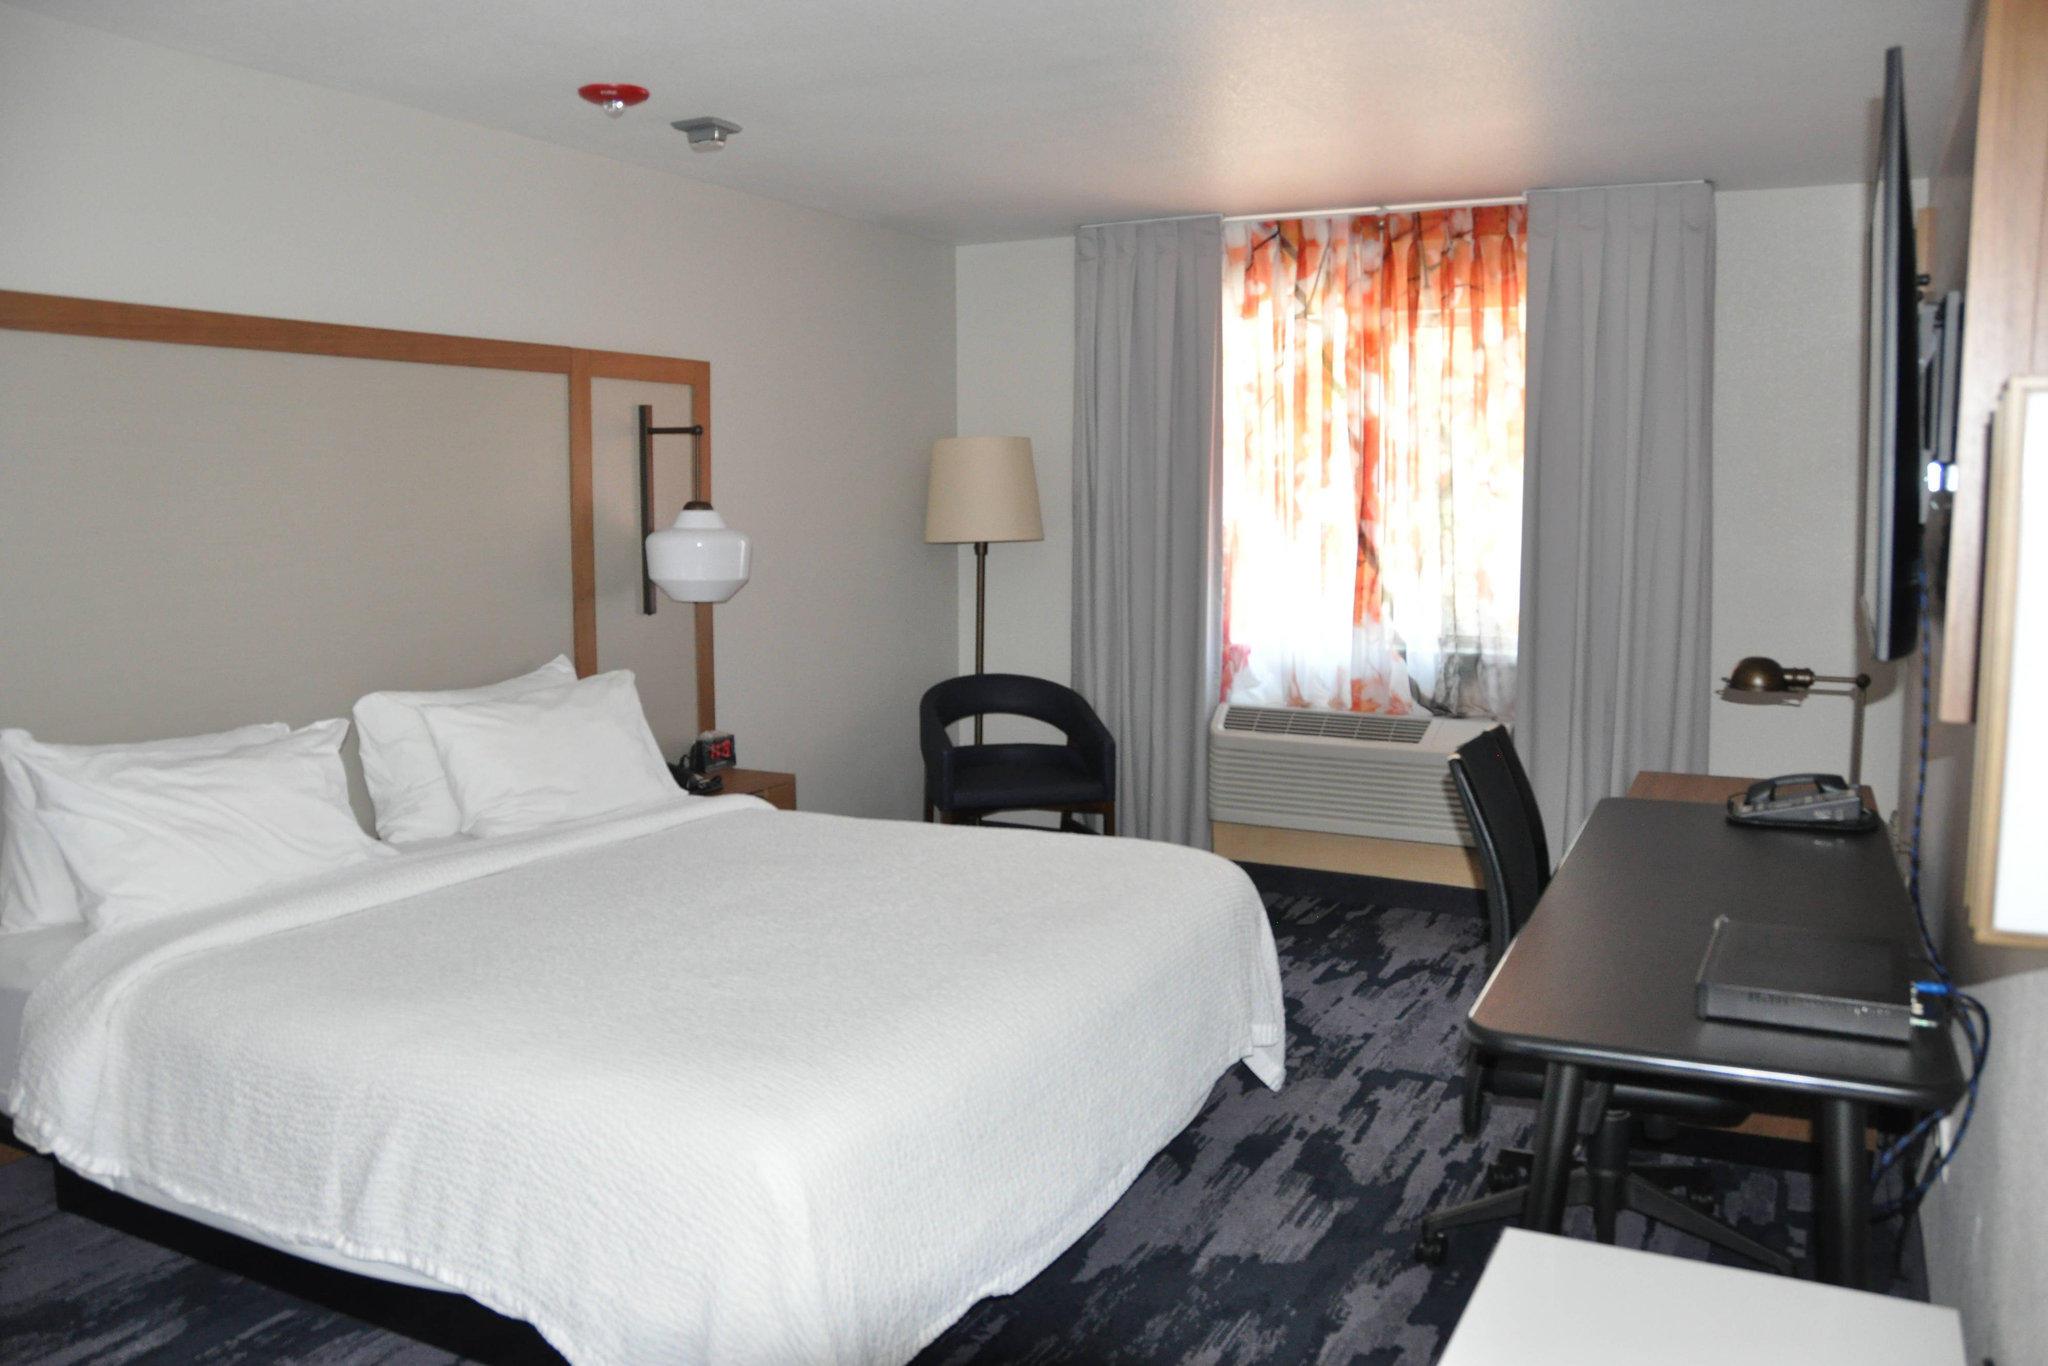 Fairfield Inn & Suites by Marriott Ukiah Mendocino County